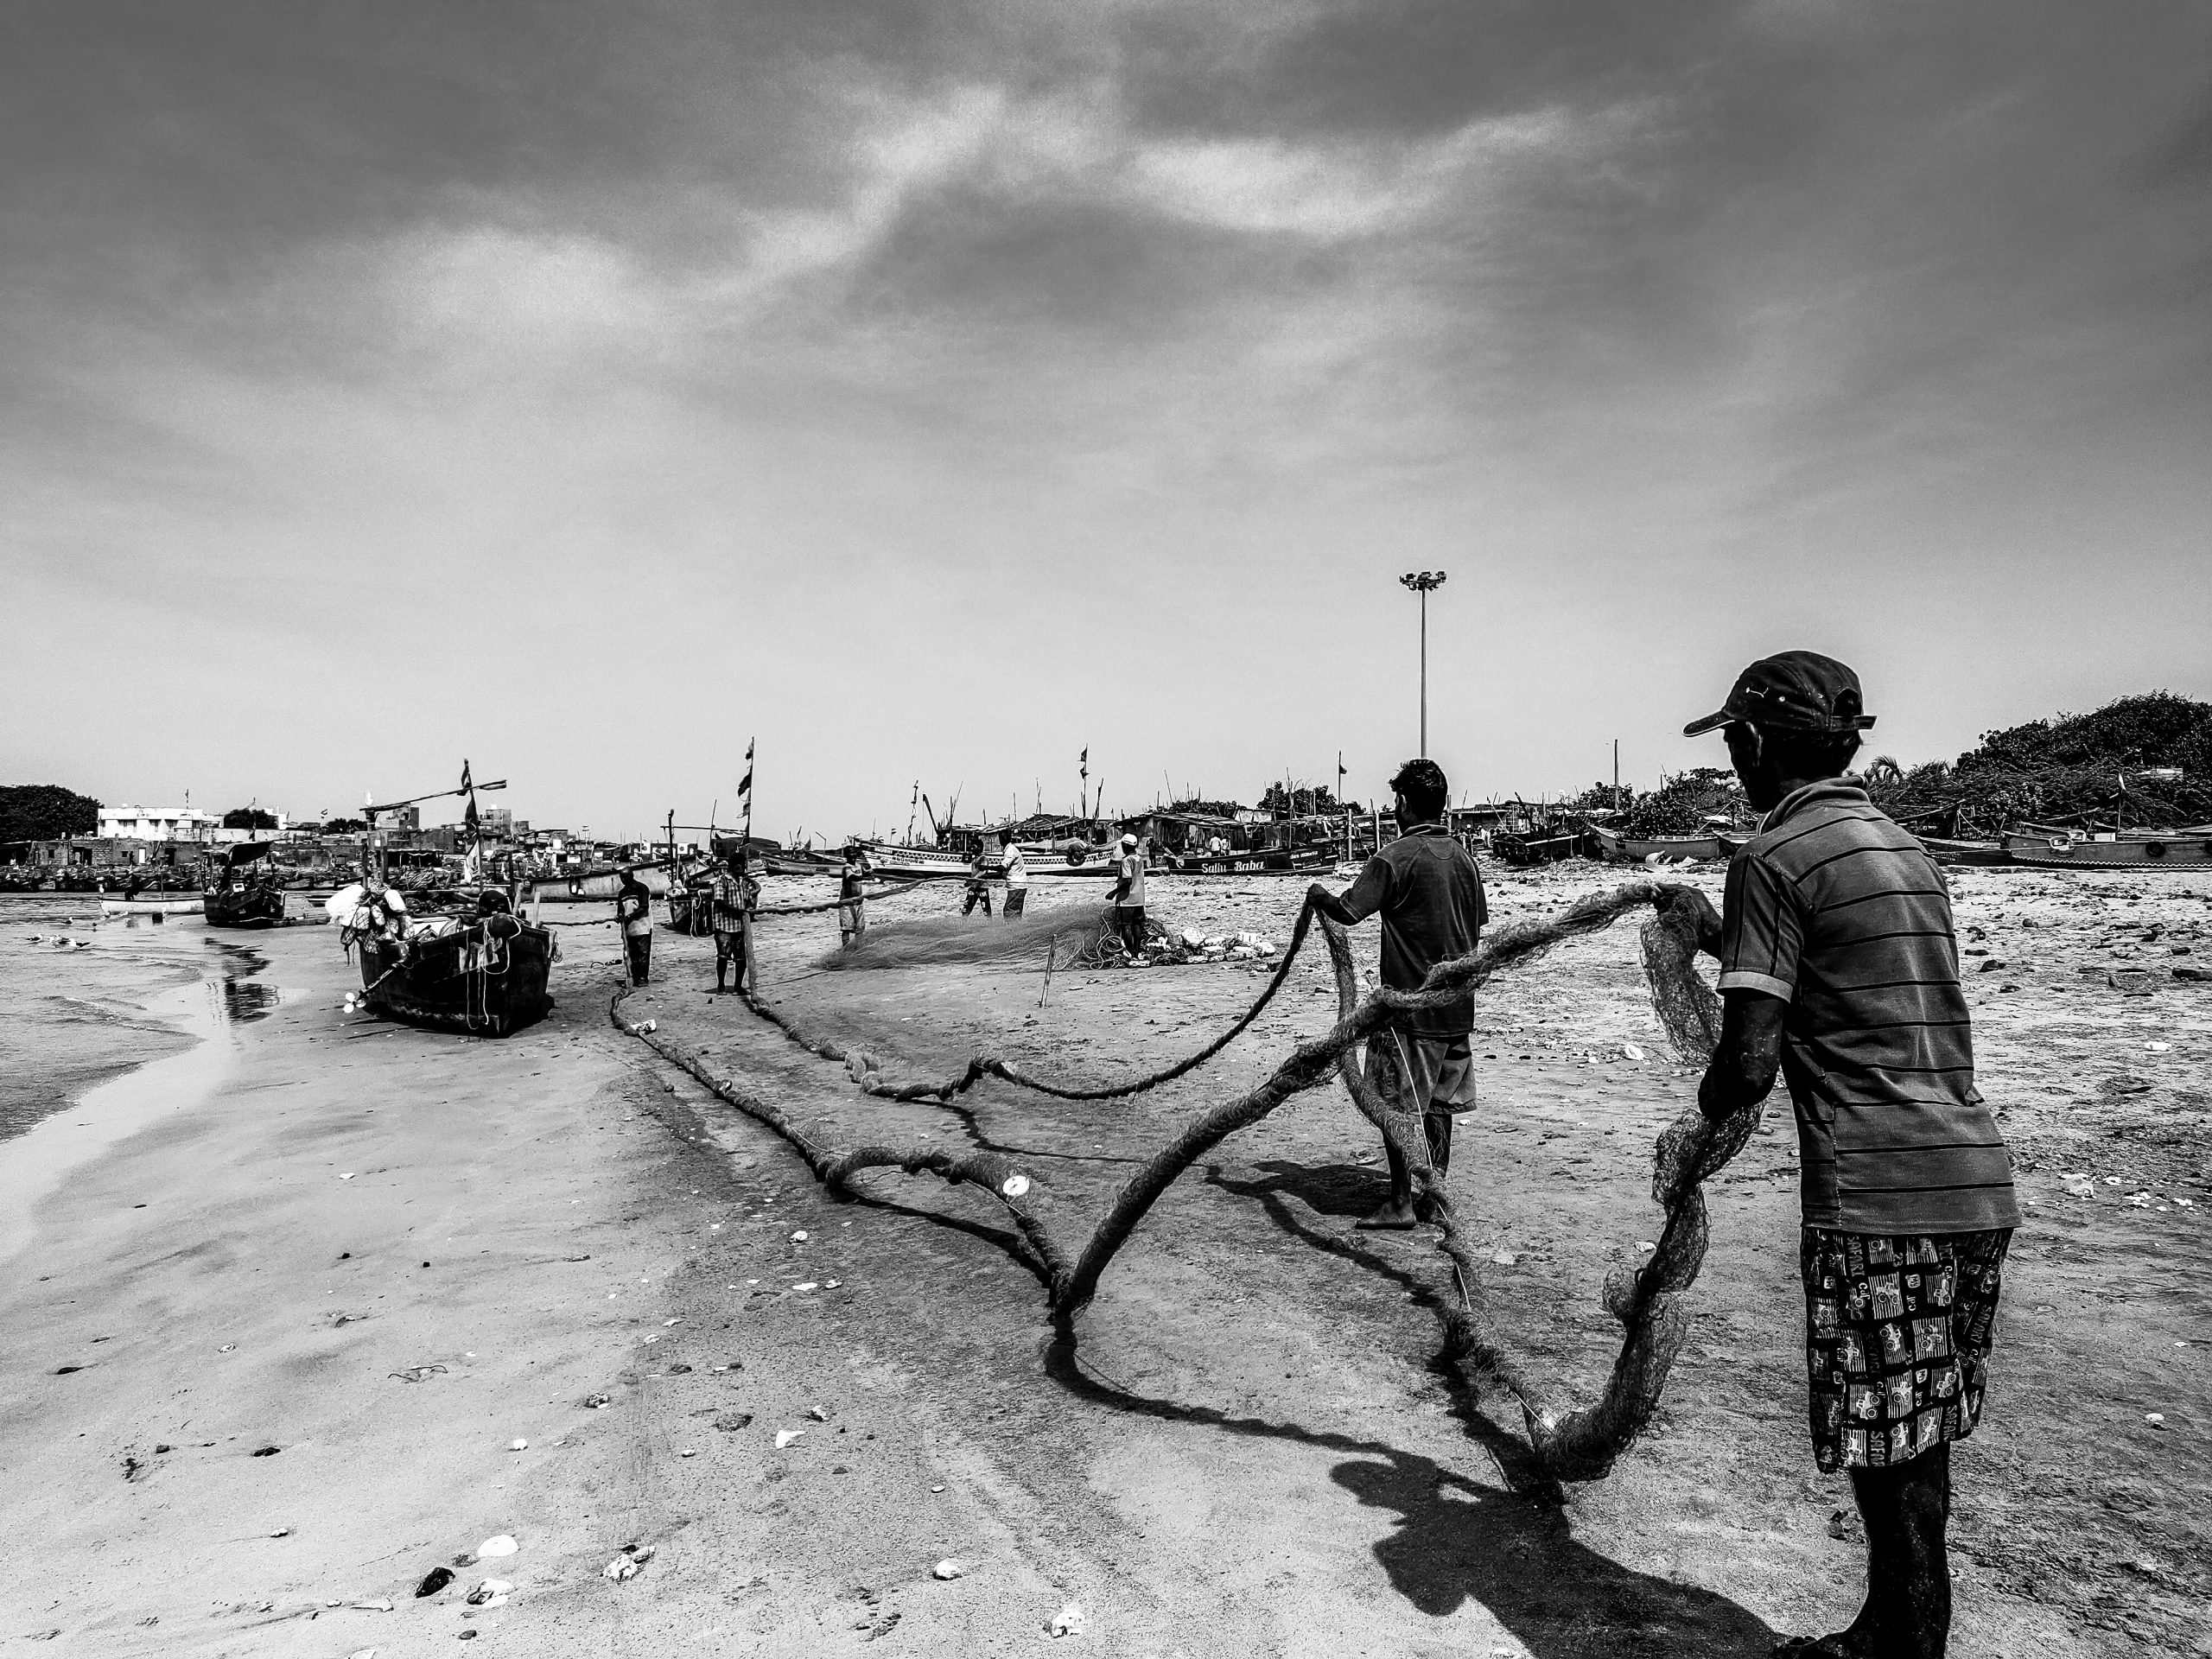 Fishermen on a beach